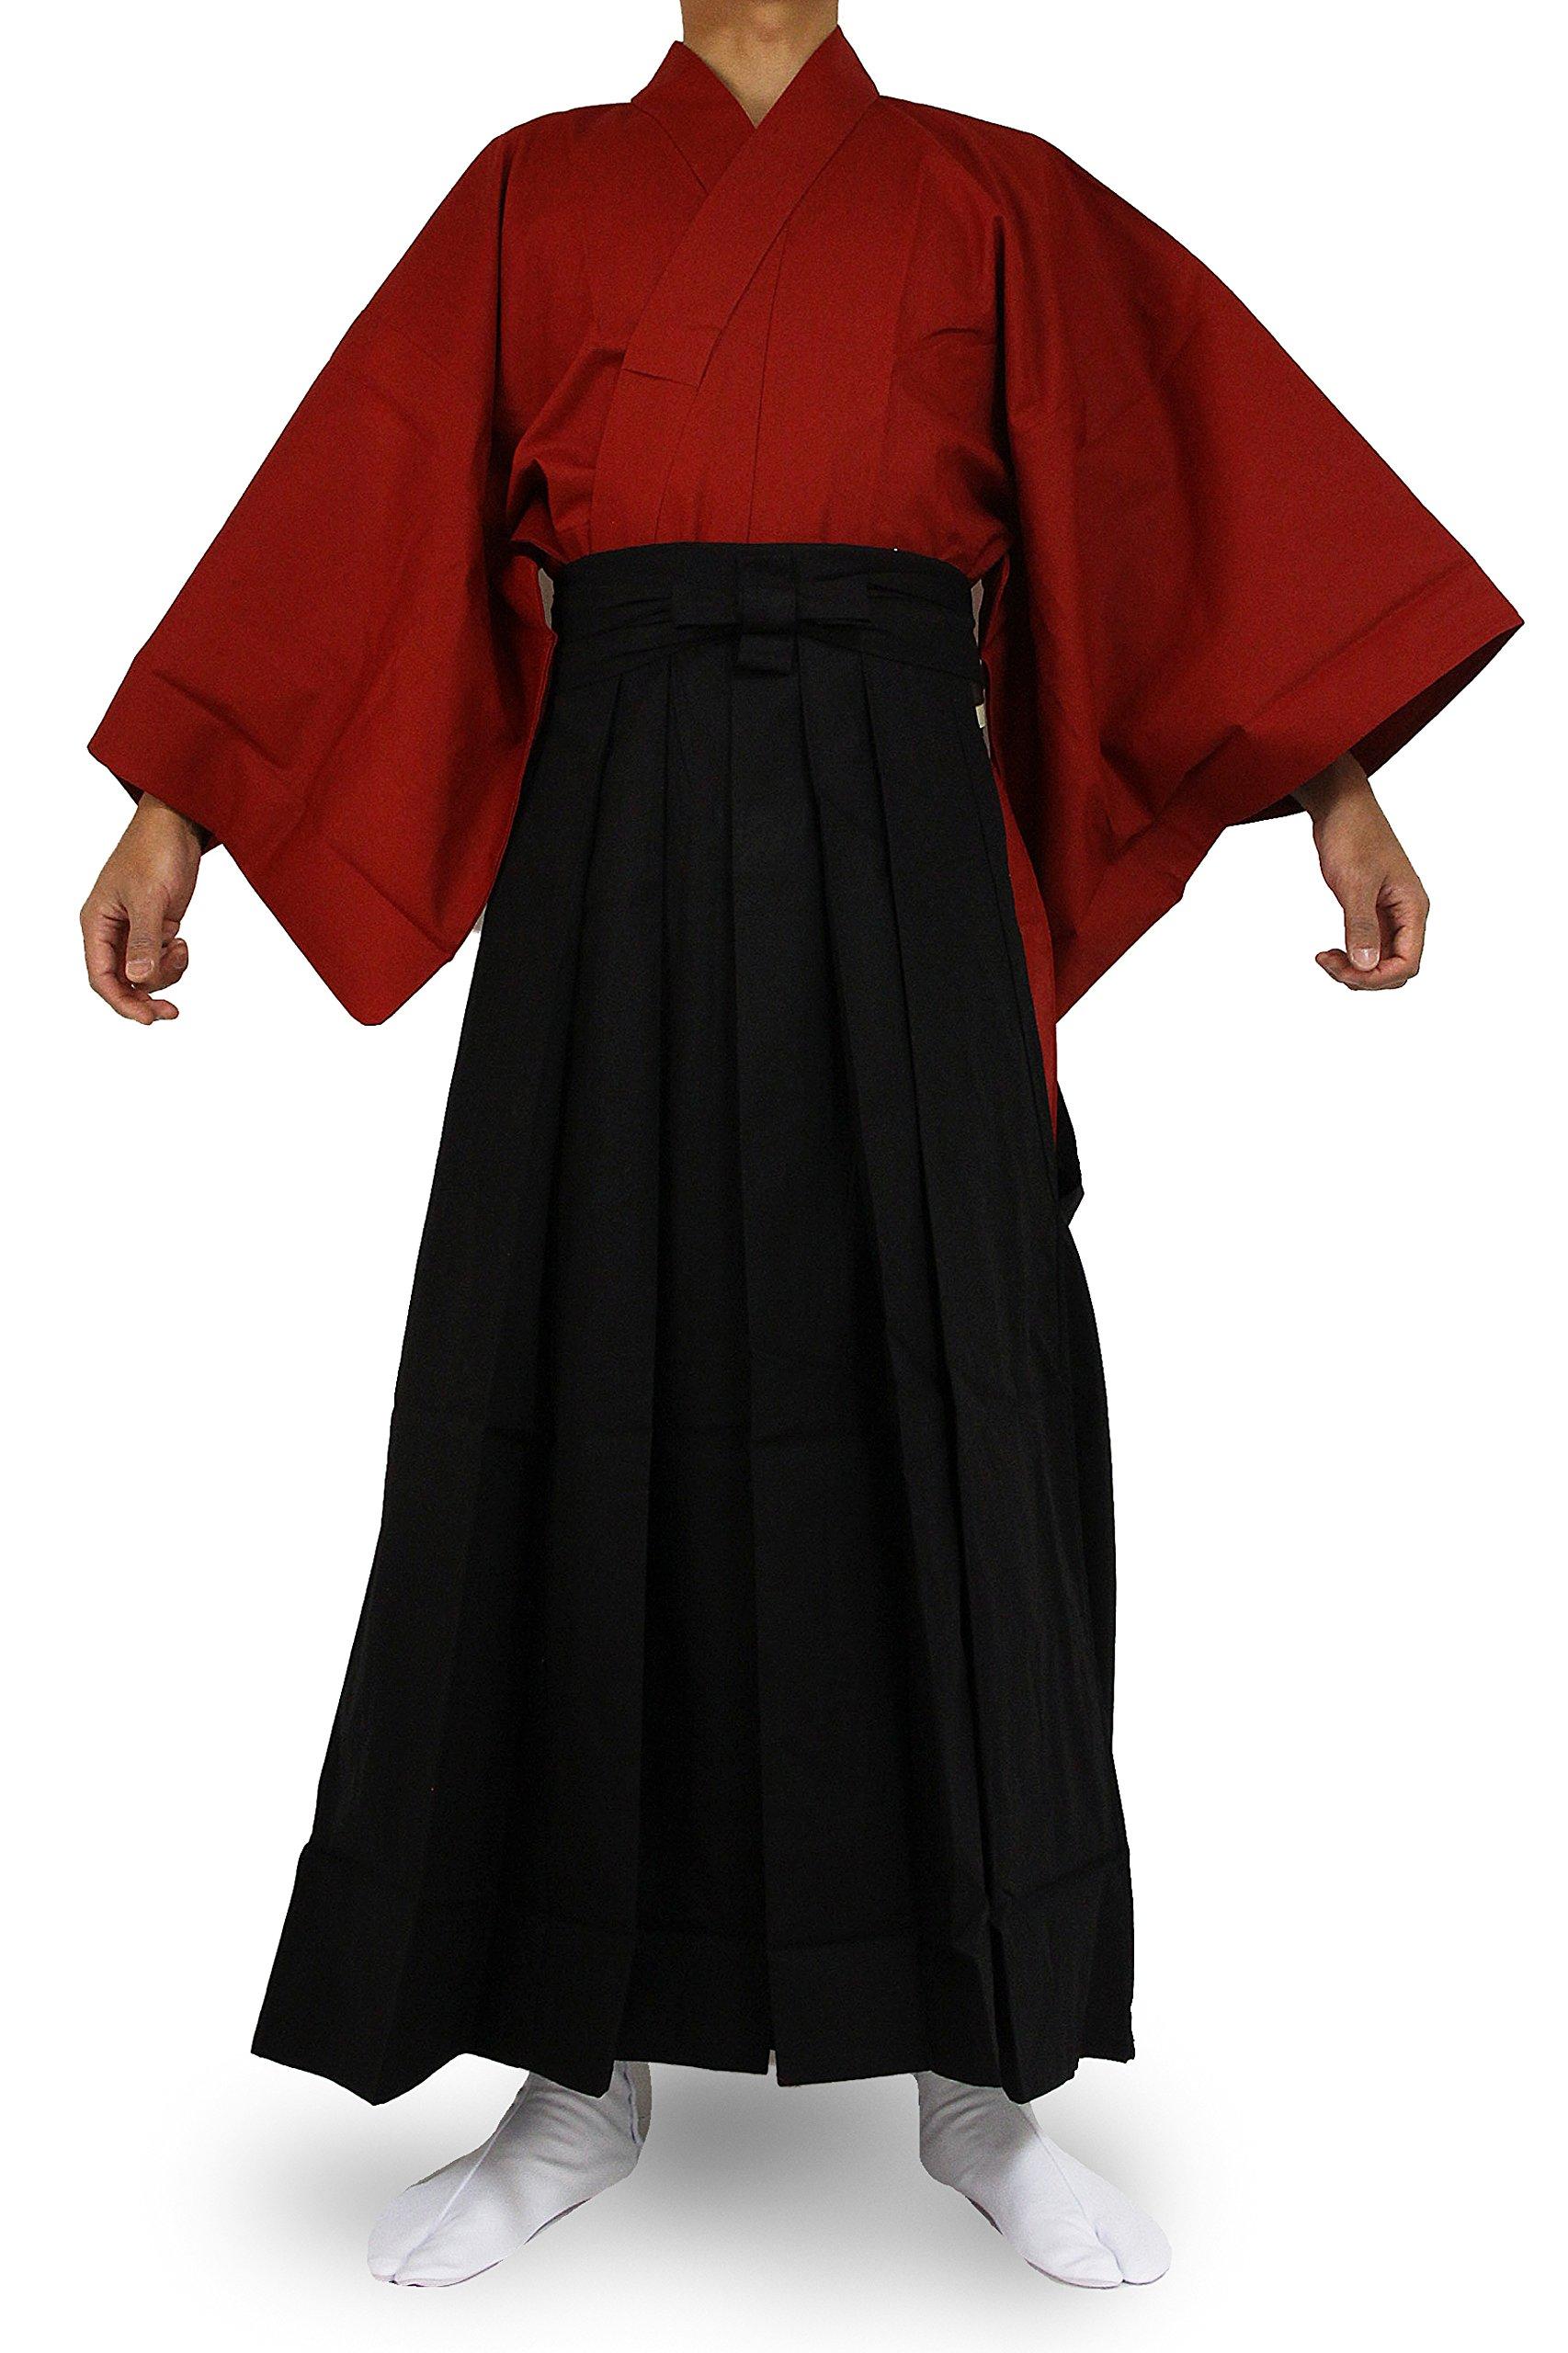 Edoten Japanese Samurai Hakama Uniform RD-BK L